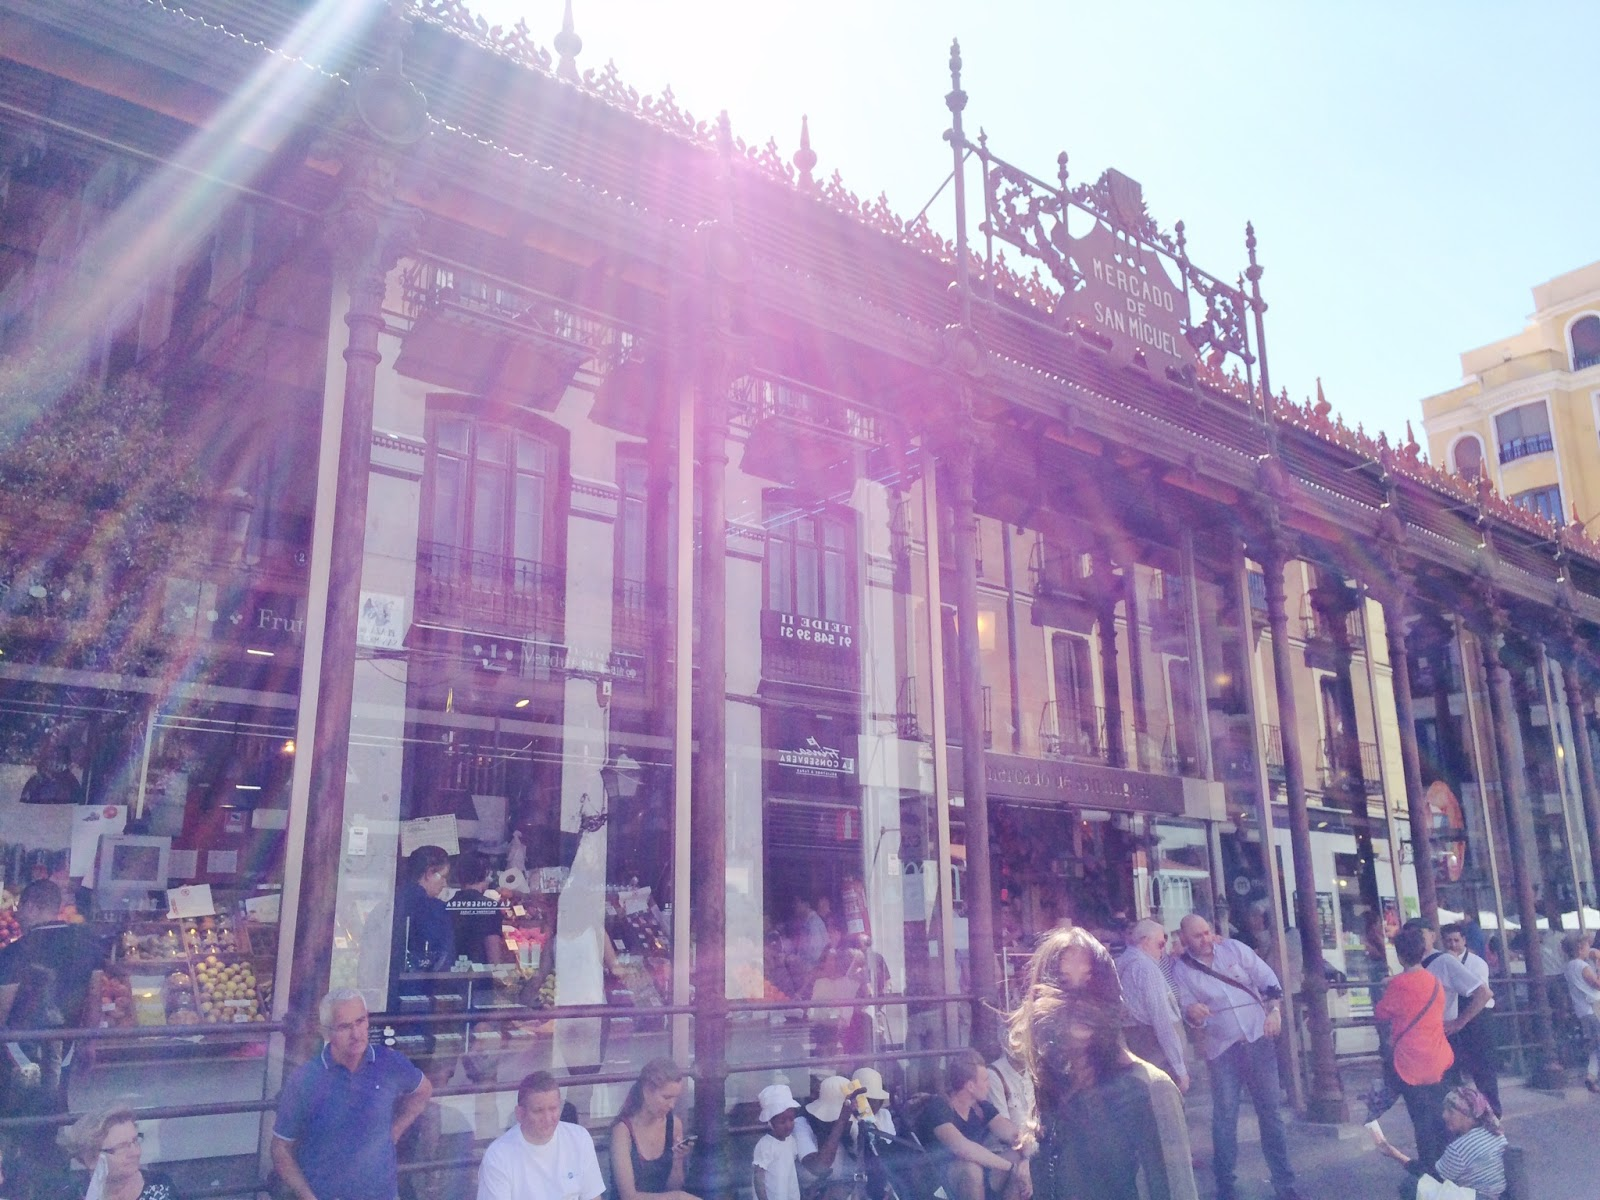 Mercado de San Miguel Madrid - Hotspot